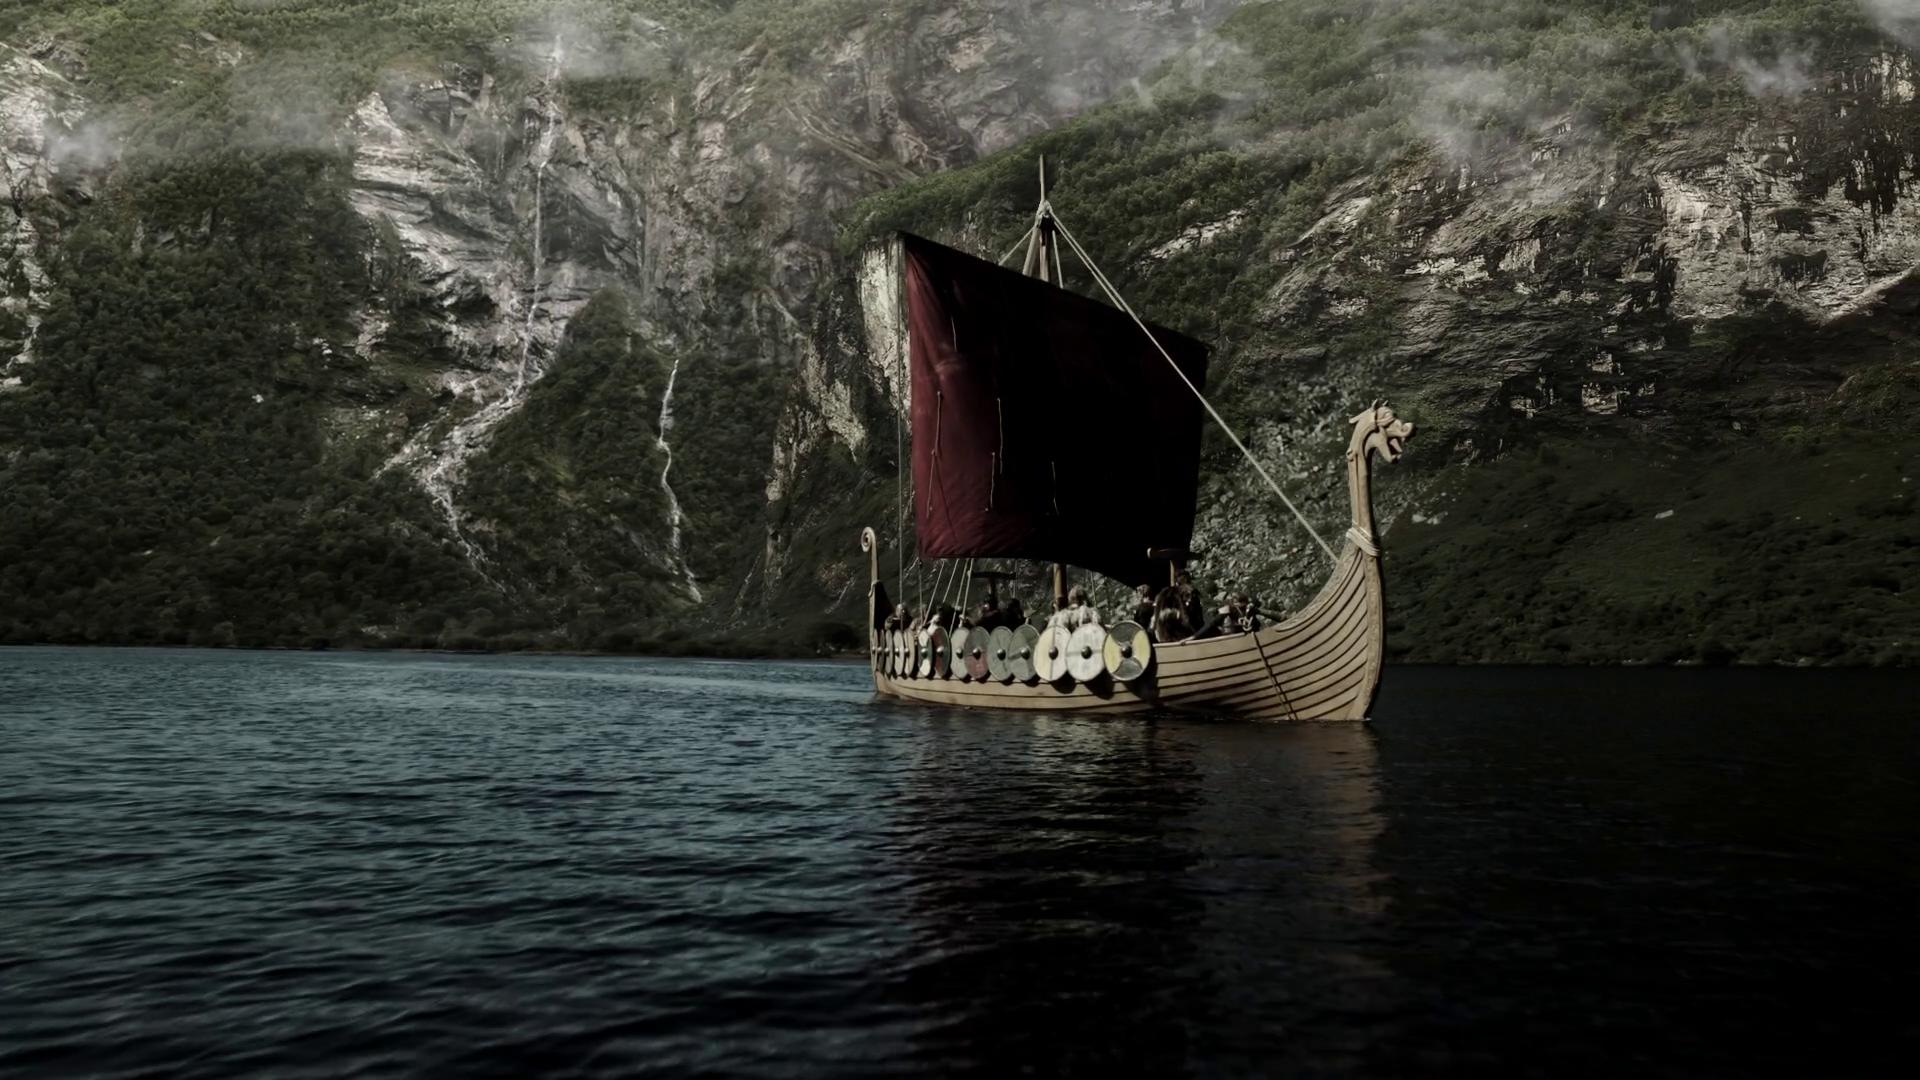 Viking Wallpapers, Viking Backgrounds, Viking Images ...